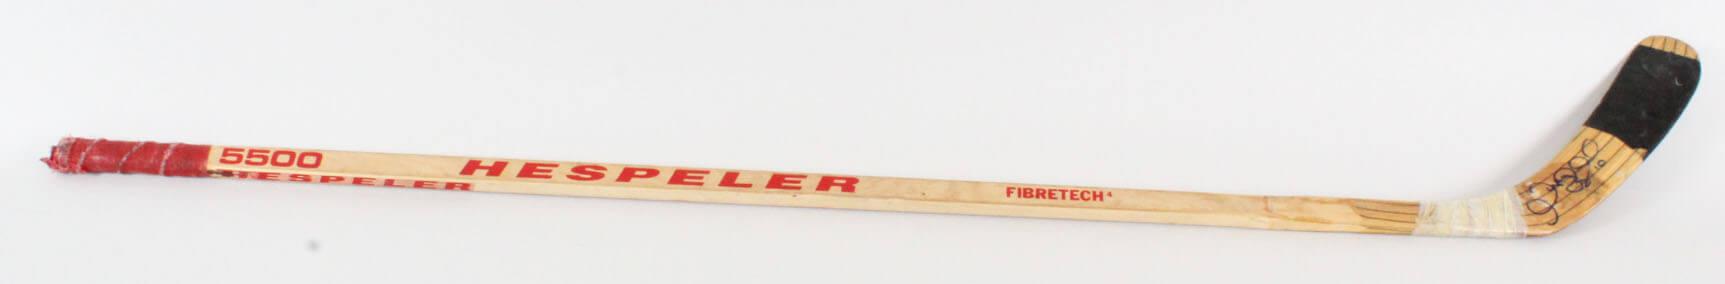 Gary Roberts Game-Used Hockey Stick Signed